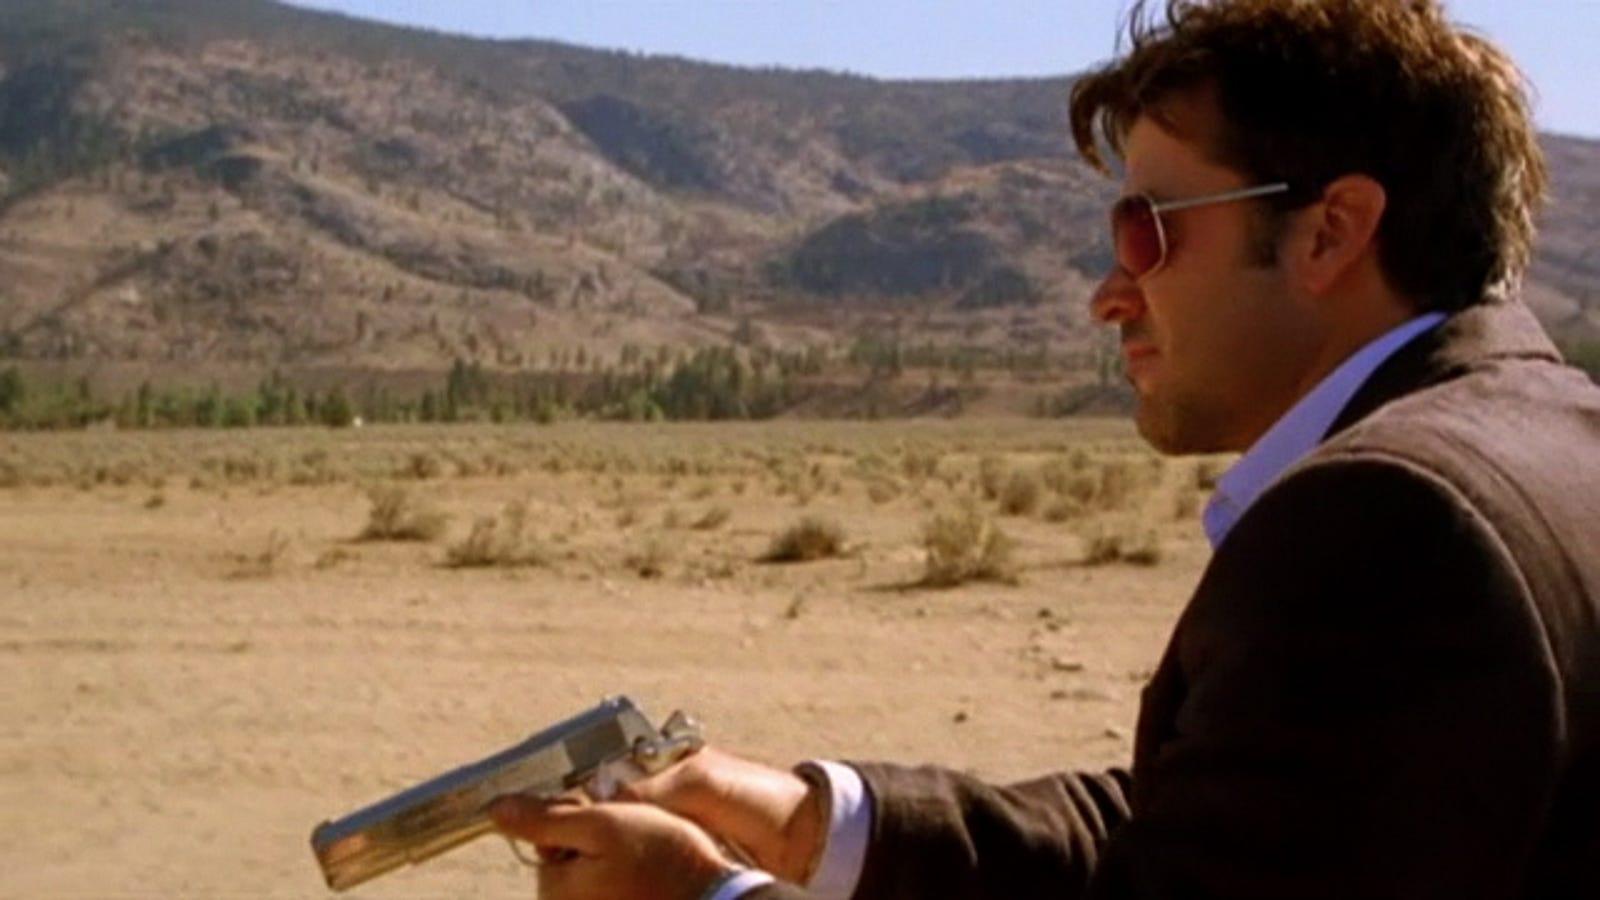 Stargate: Atlantis Rewatch - Season 5, Episode 19 Vegas